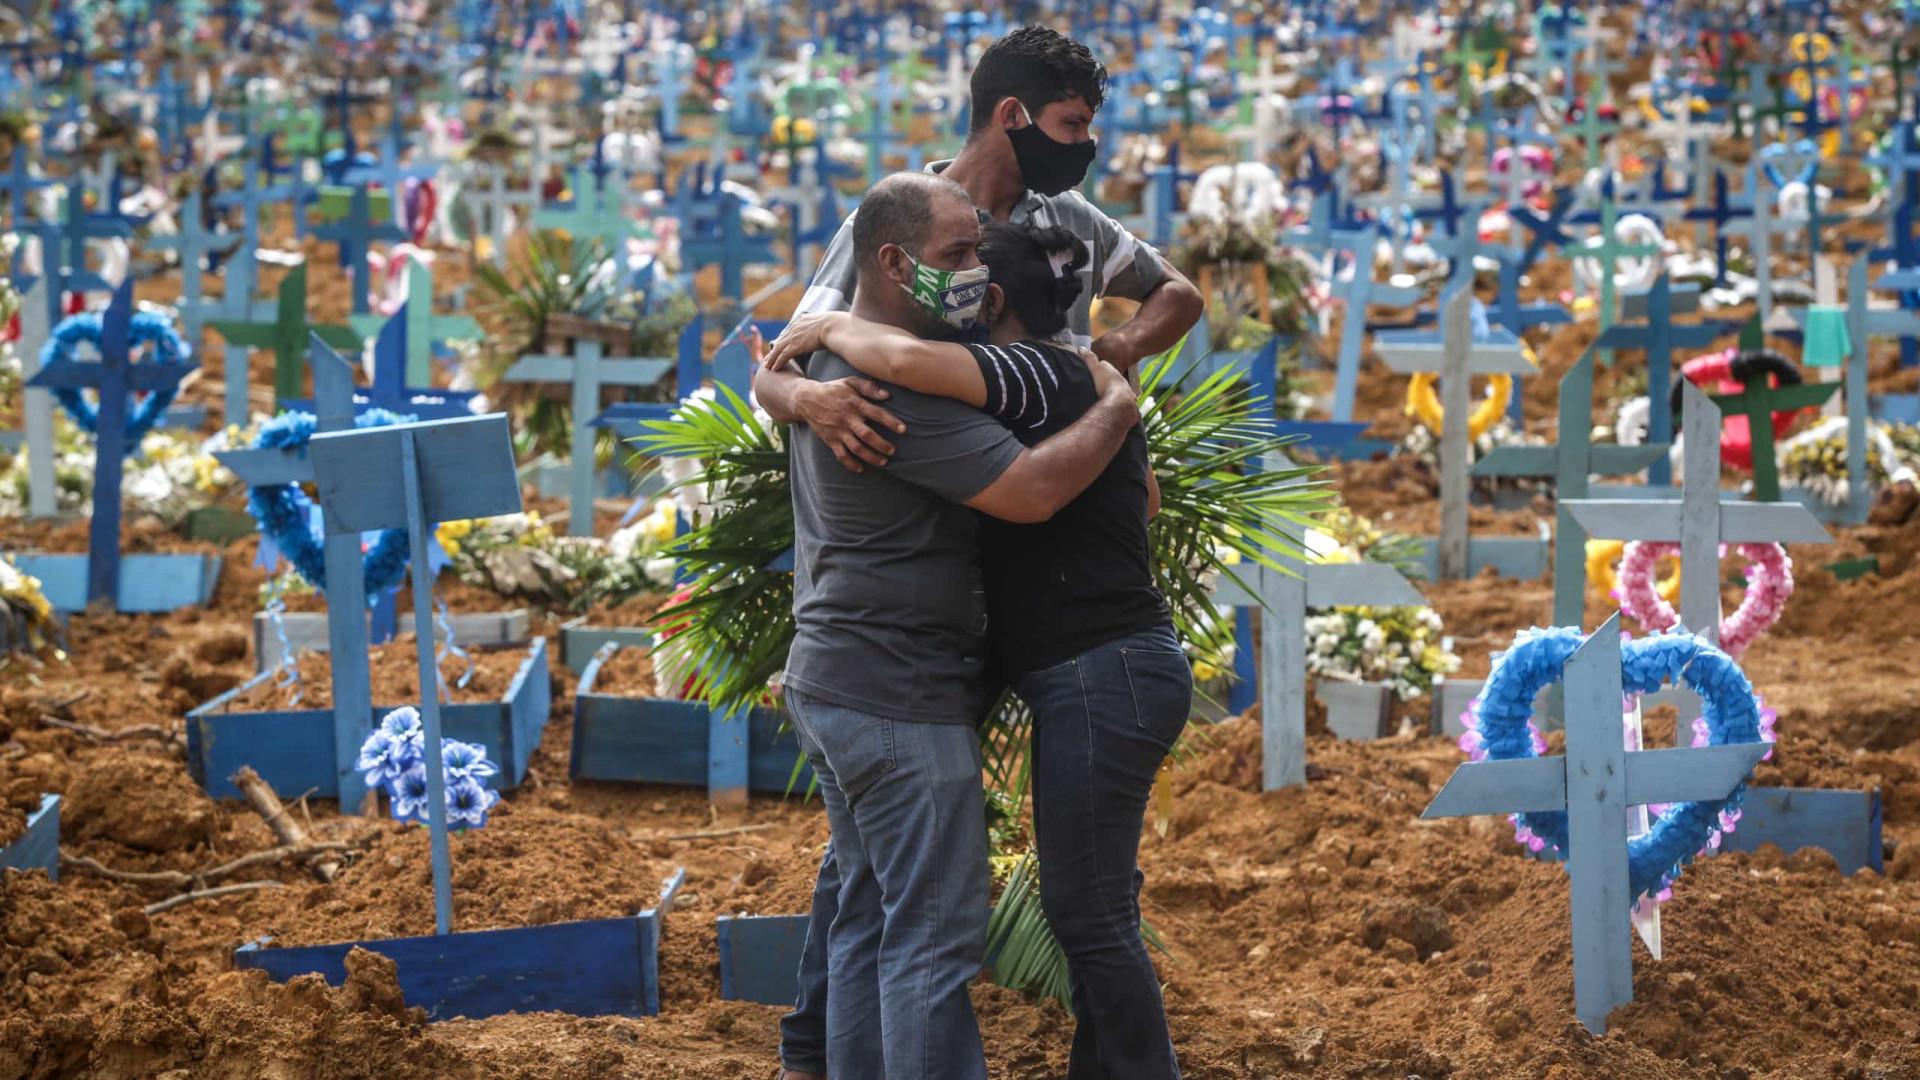 Brasil passa das 196 mil mortes por Covid-19, mostra consórcio de imprensa